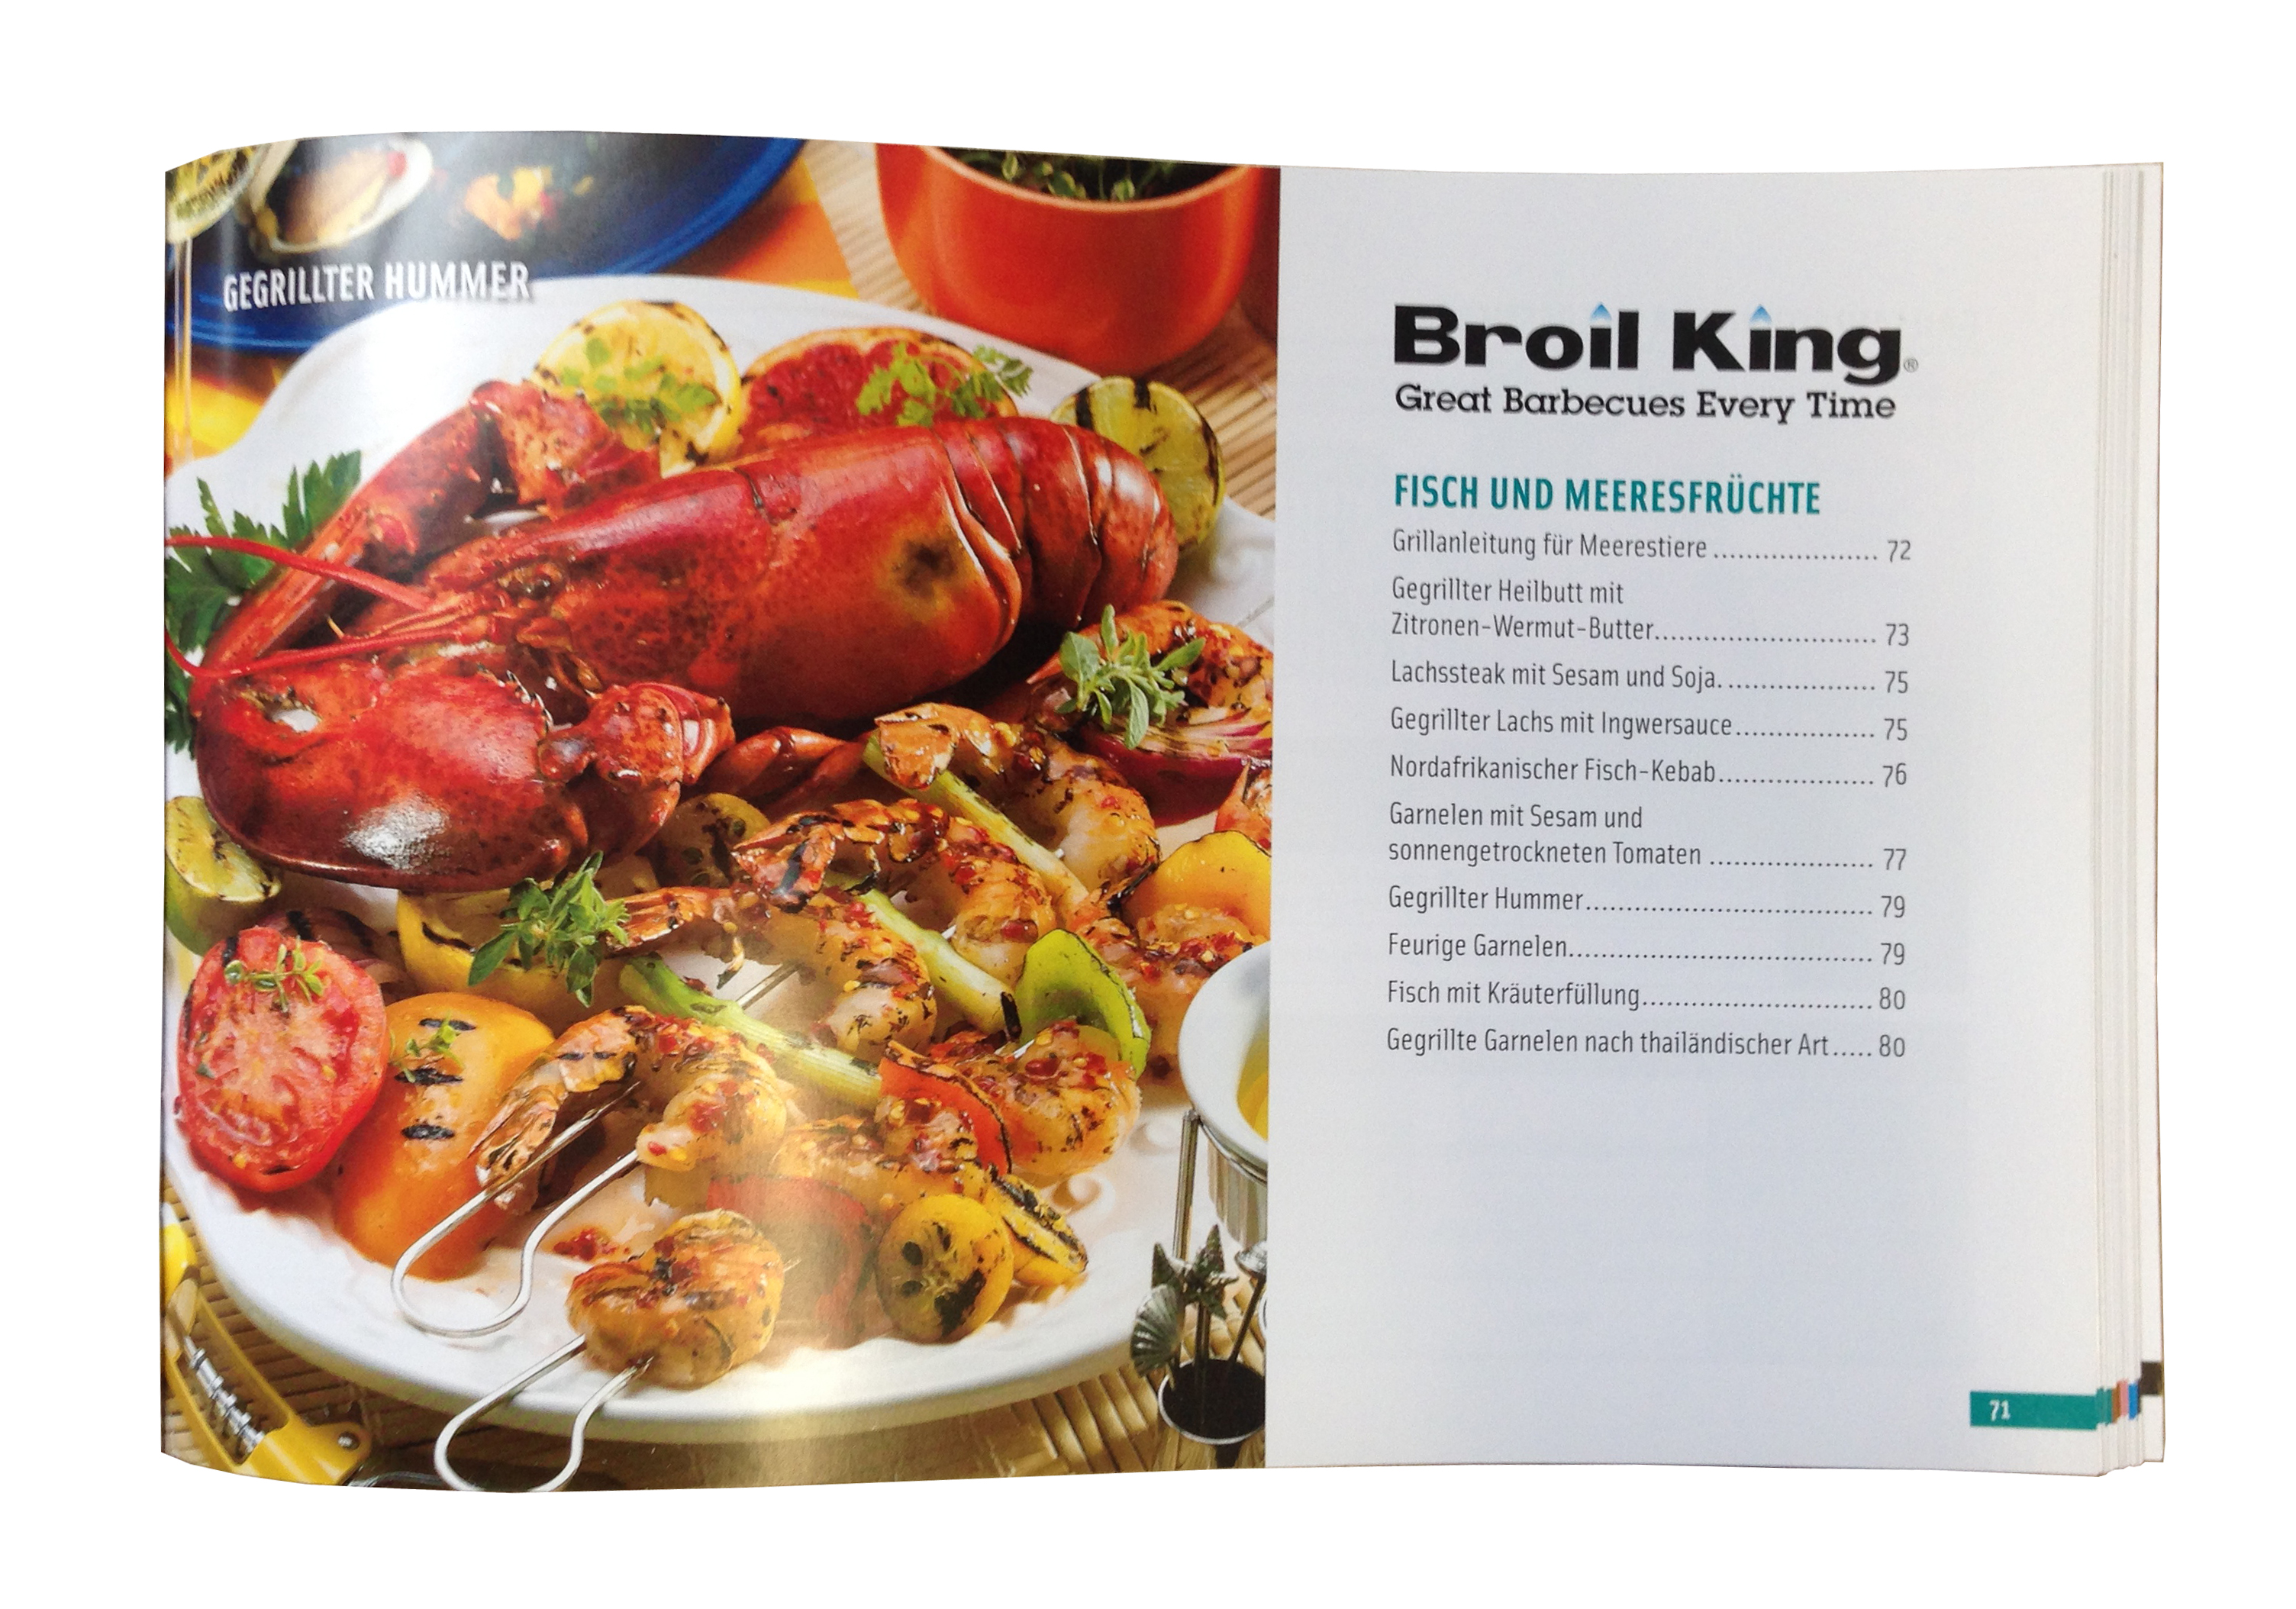 Landmann Gasgrill Kochbuch : Gasgrills immer startklar immer perfekt grillen mit bbq love